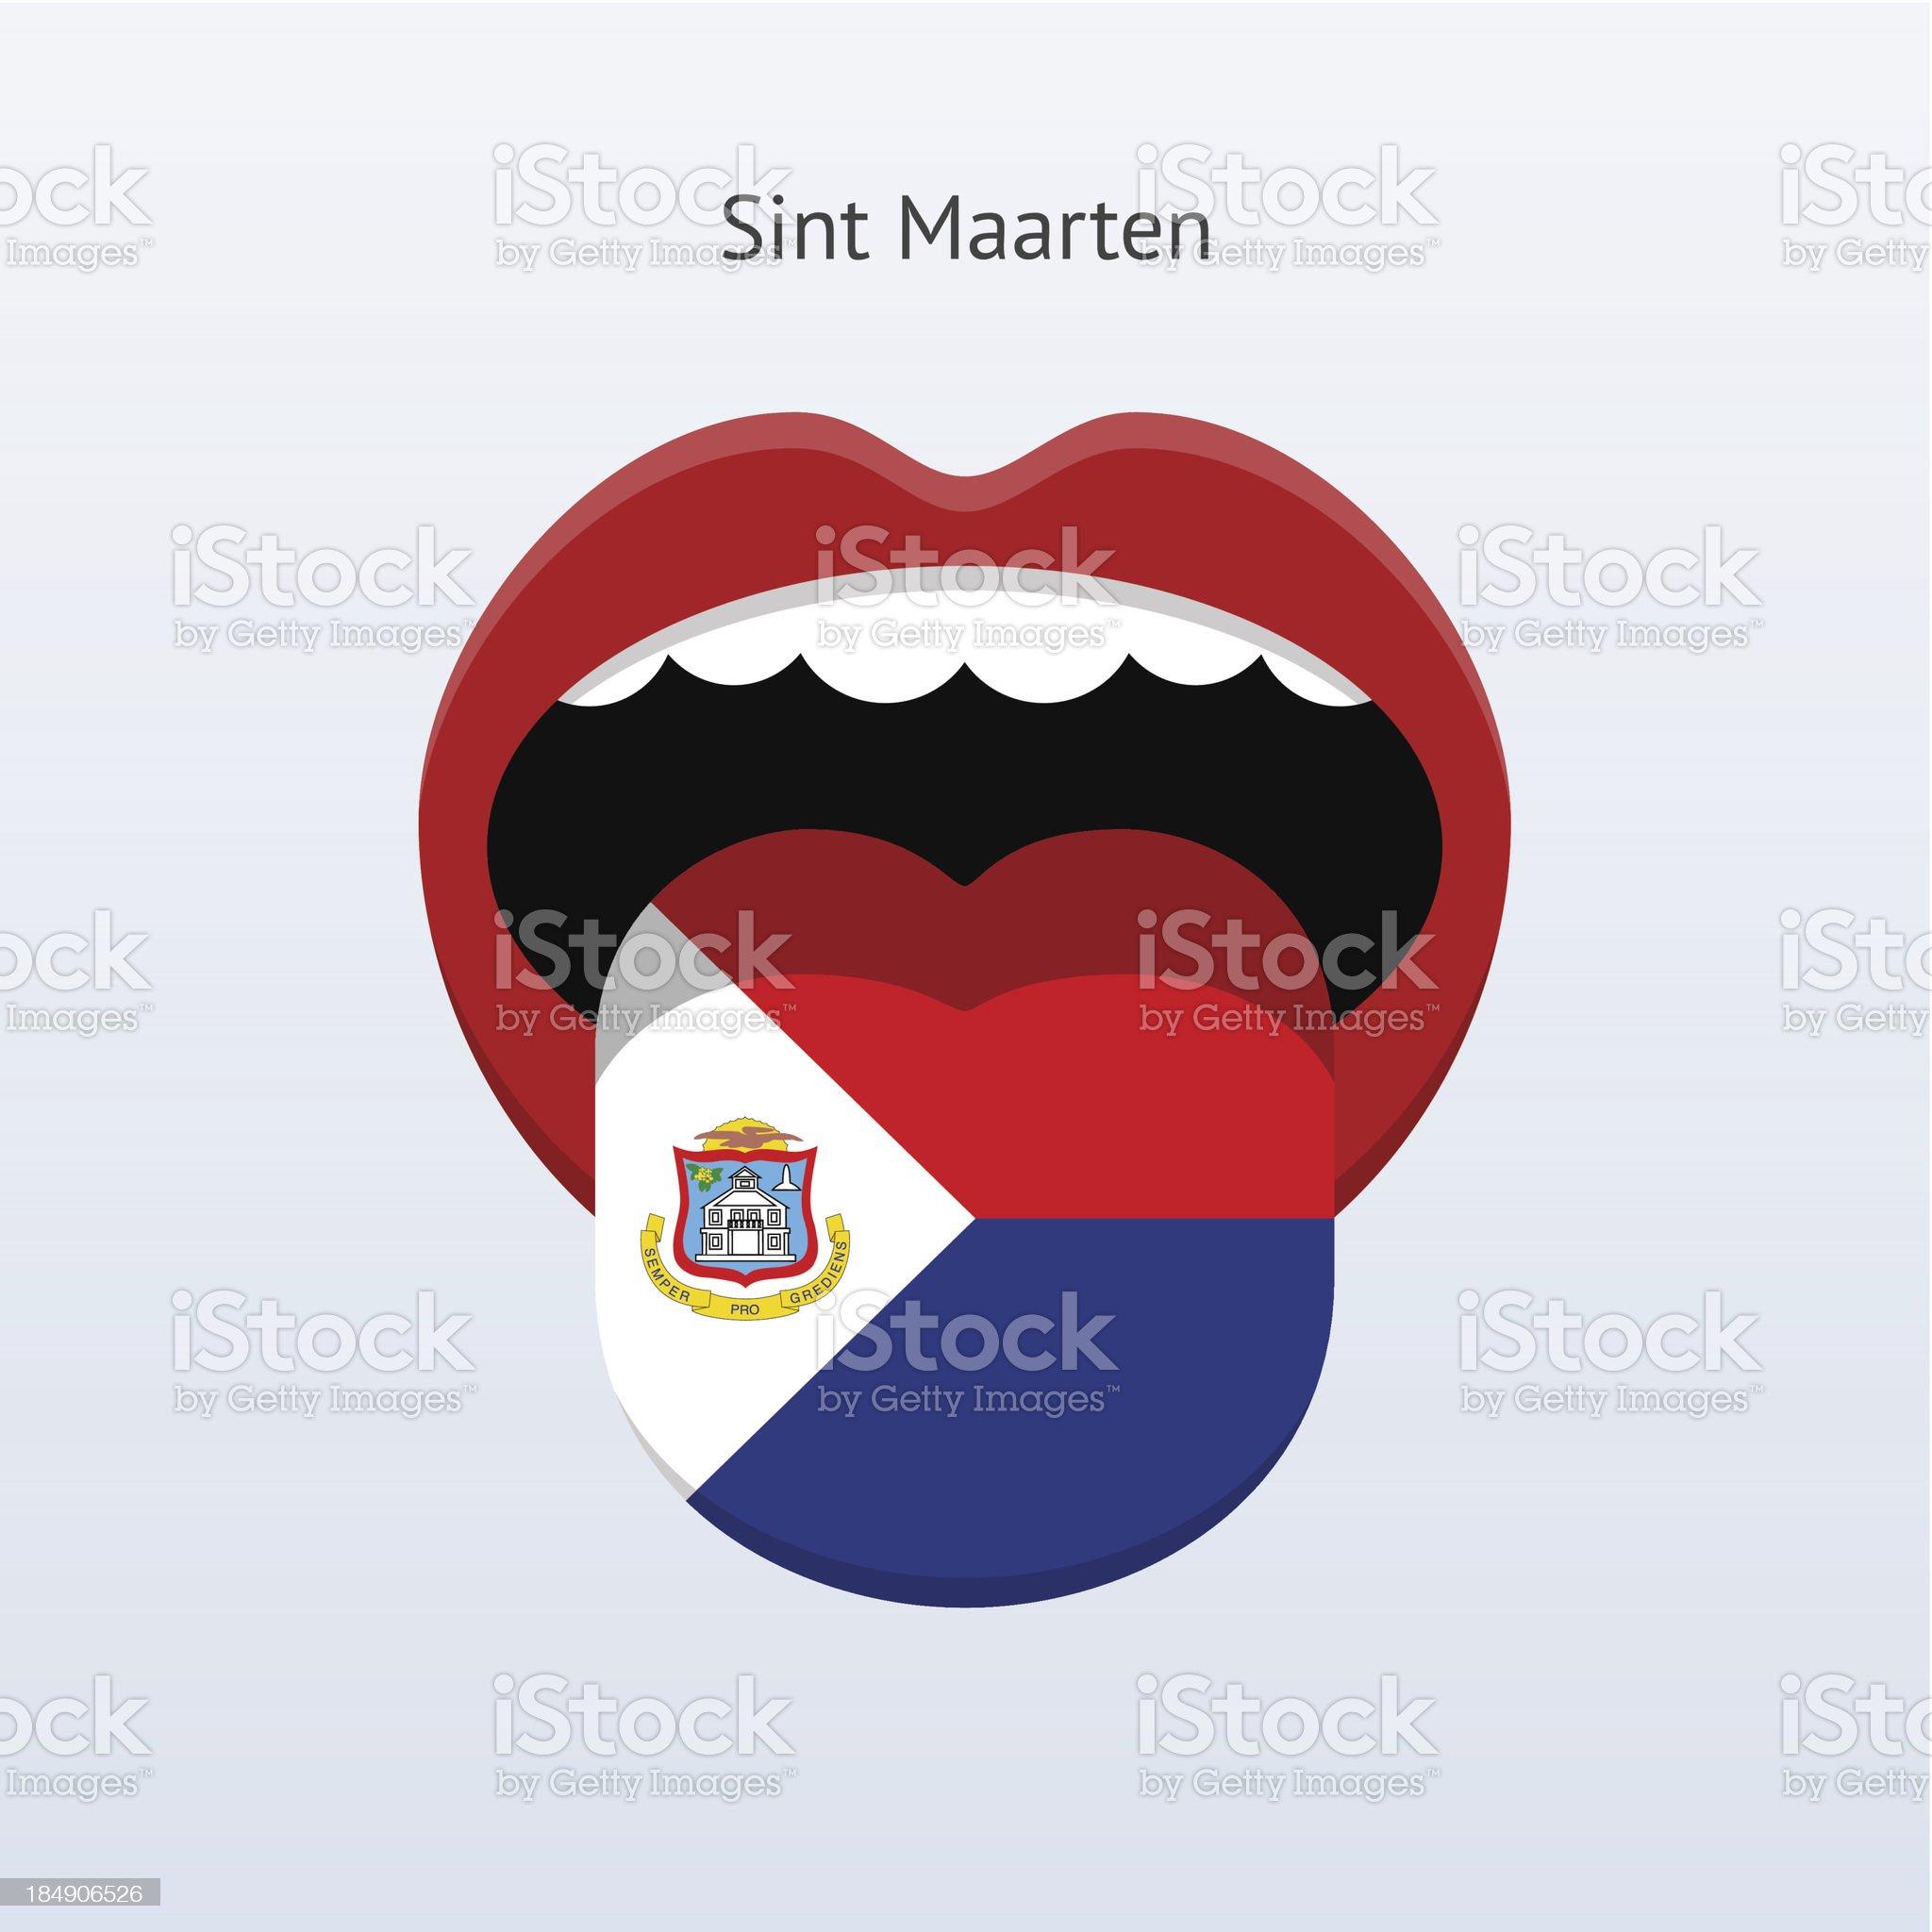 Sint Maarten language. Abstract human tongue. royalty-free stock vector art